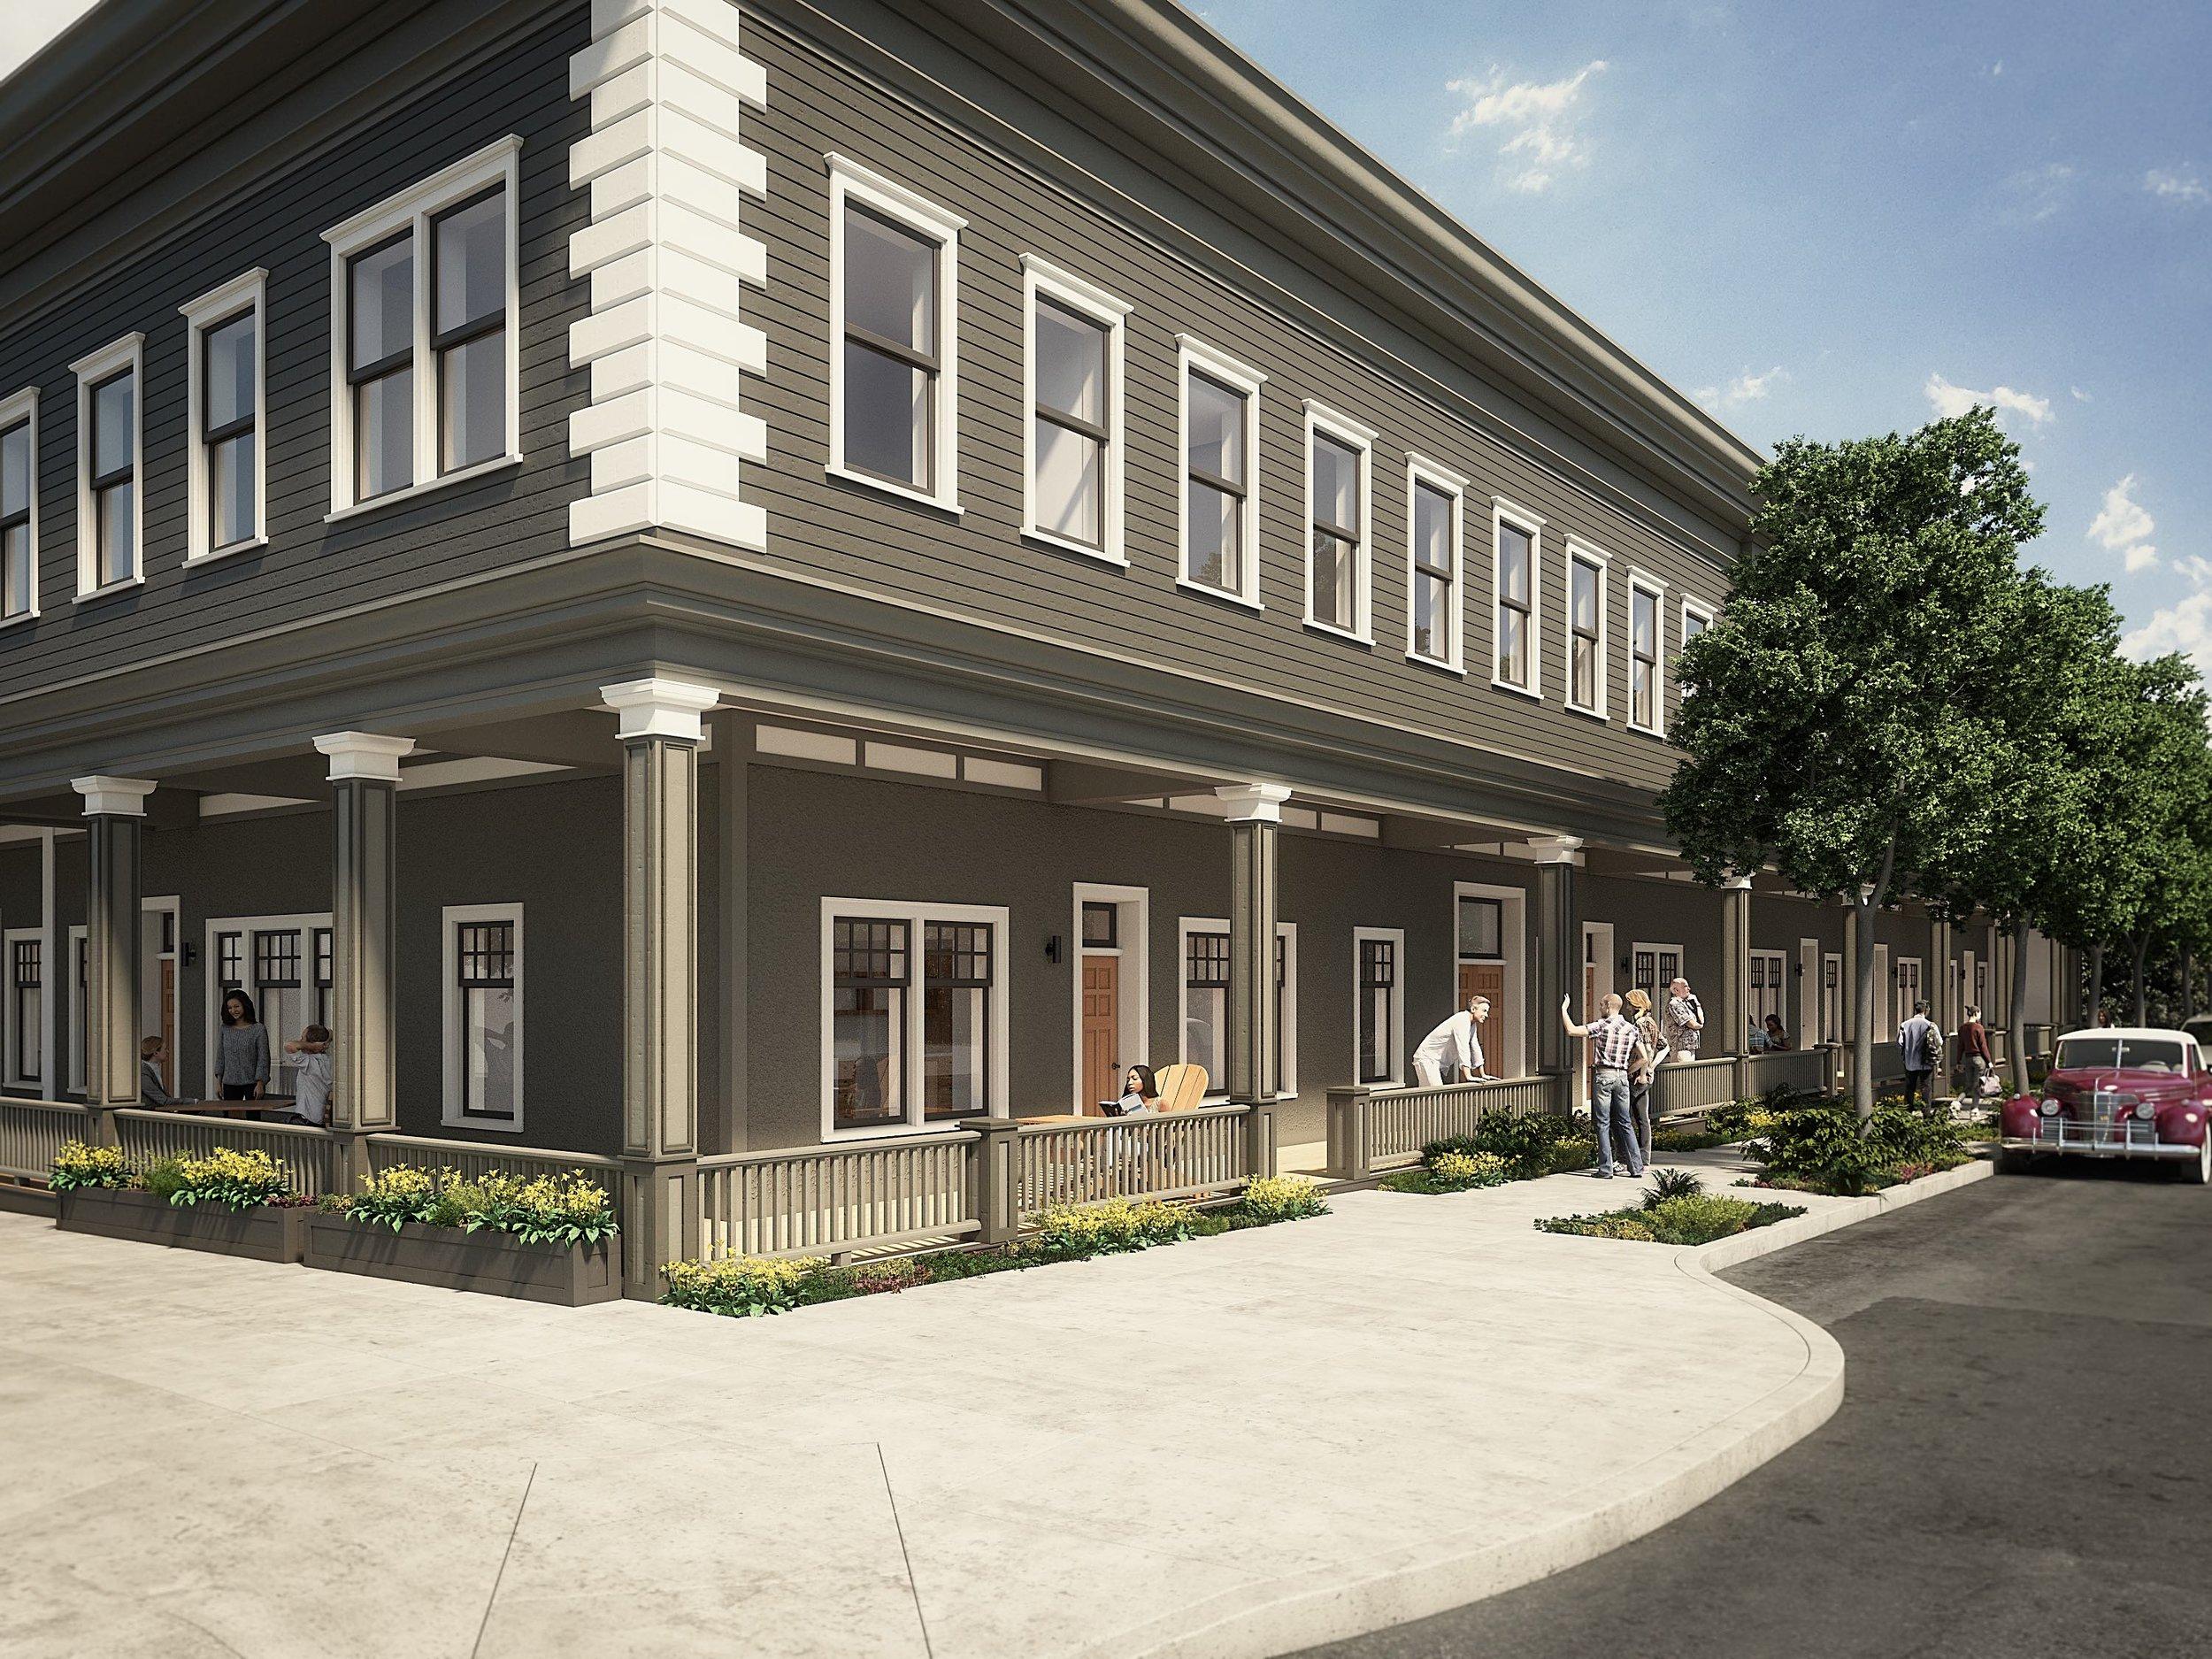 17014_Fairmont Apartments_Street_v005 copy.jpg